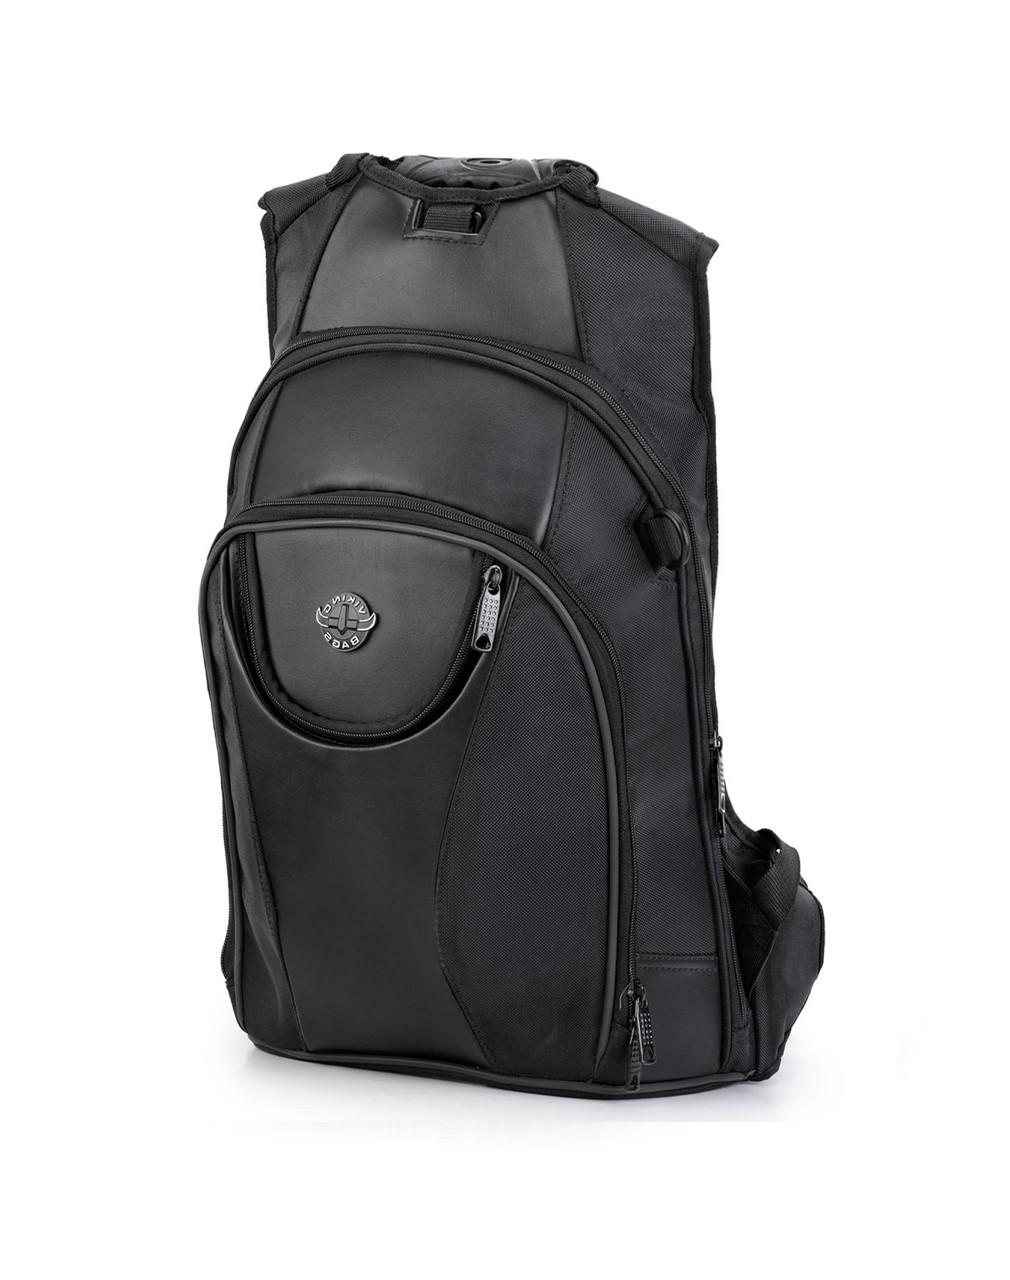 Viking Large Black Street/Sportbike Back pack Main Bag View